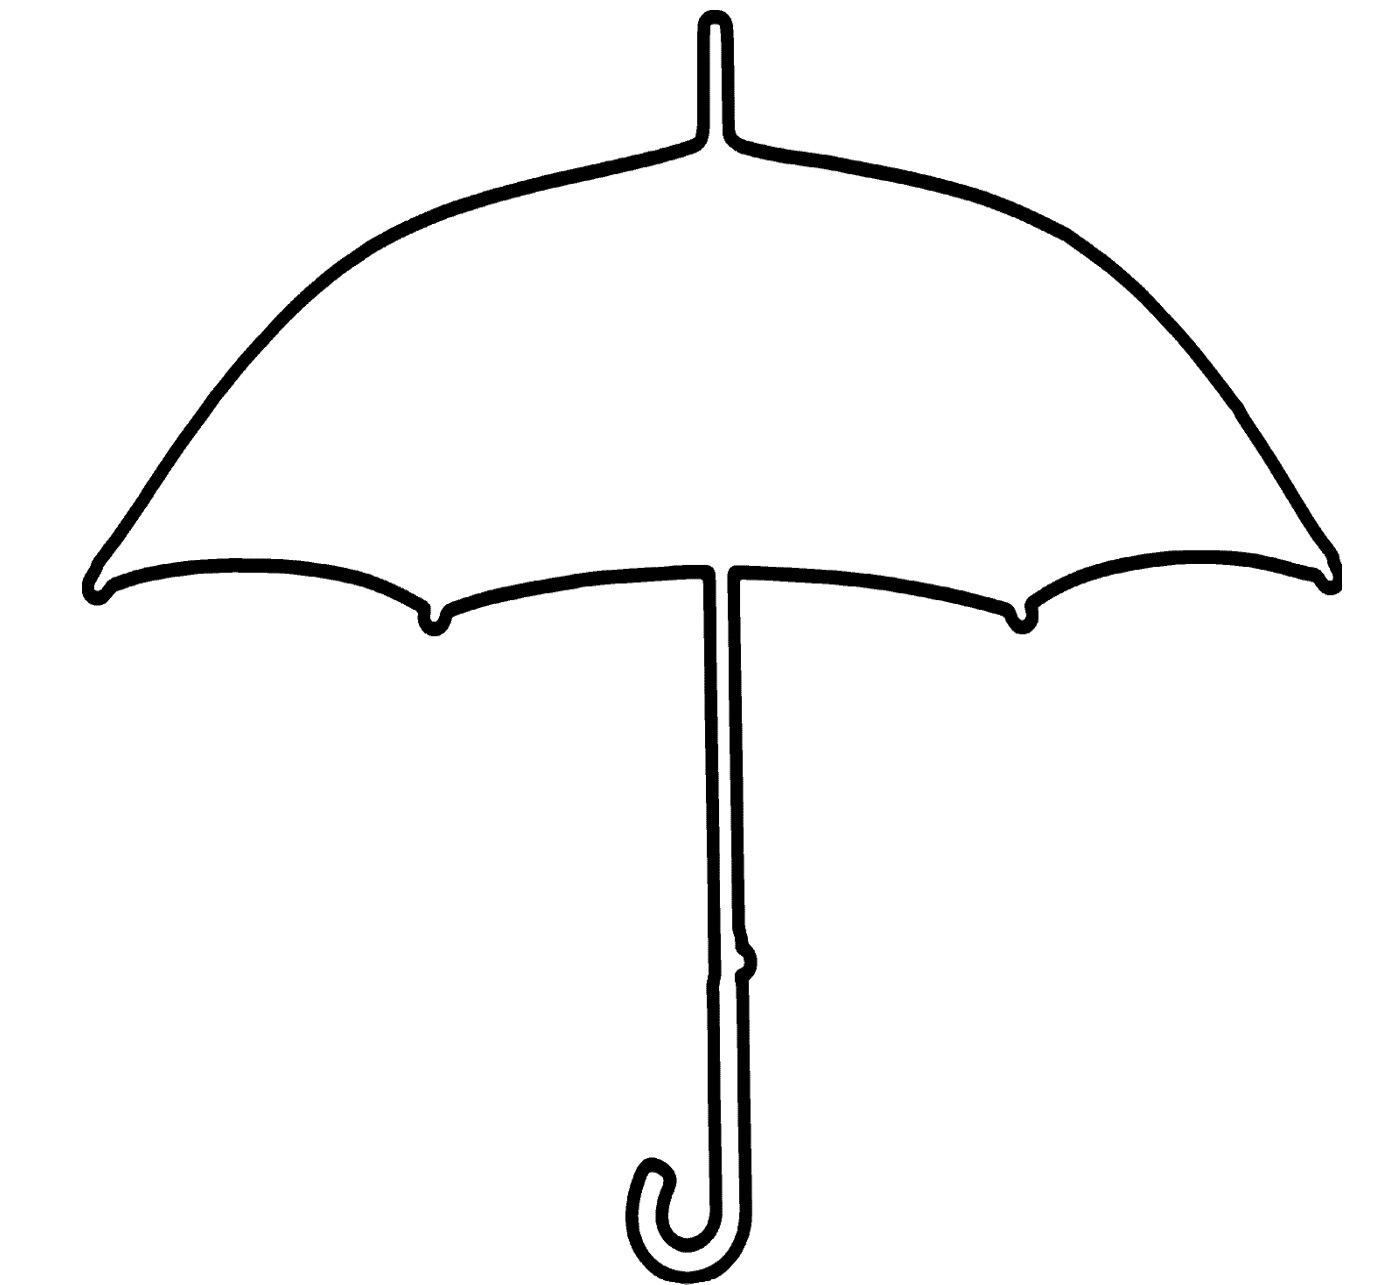 1397x1285 Umbrella Black And White Photos Of Umbrella Outline Clip Art Black